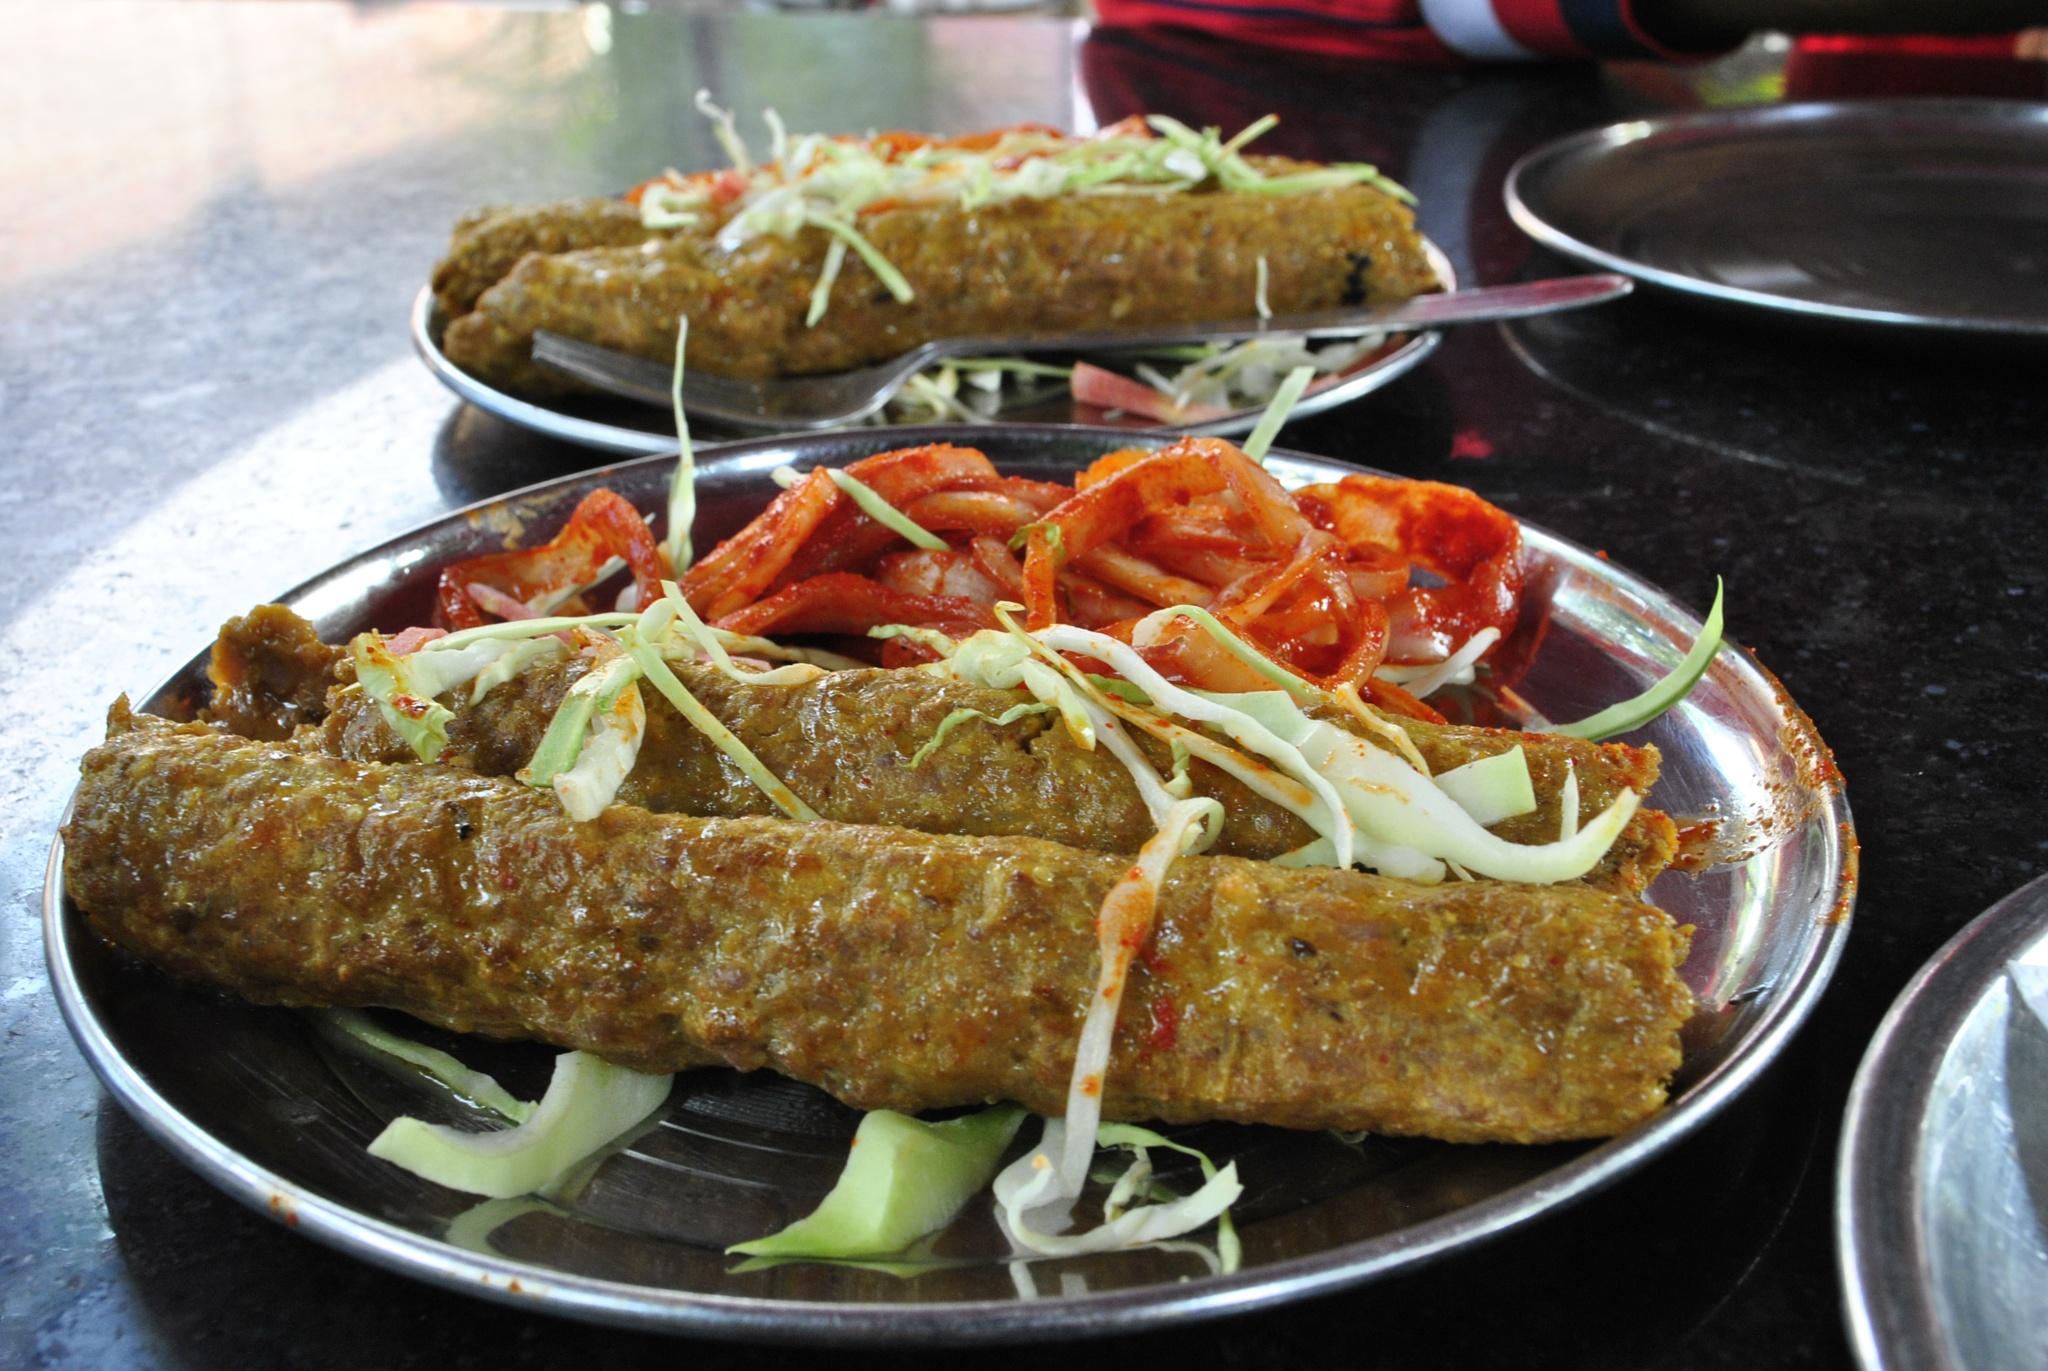 Two Plates of Chicken Seekh Kebab by Jyoti P. Deka